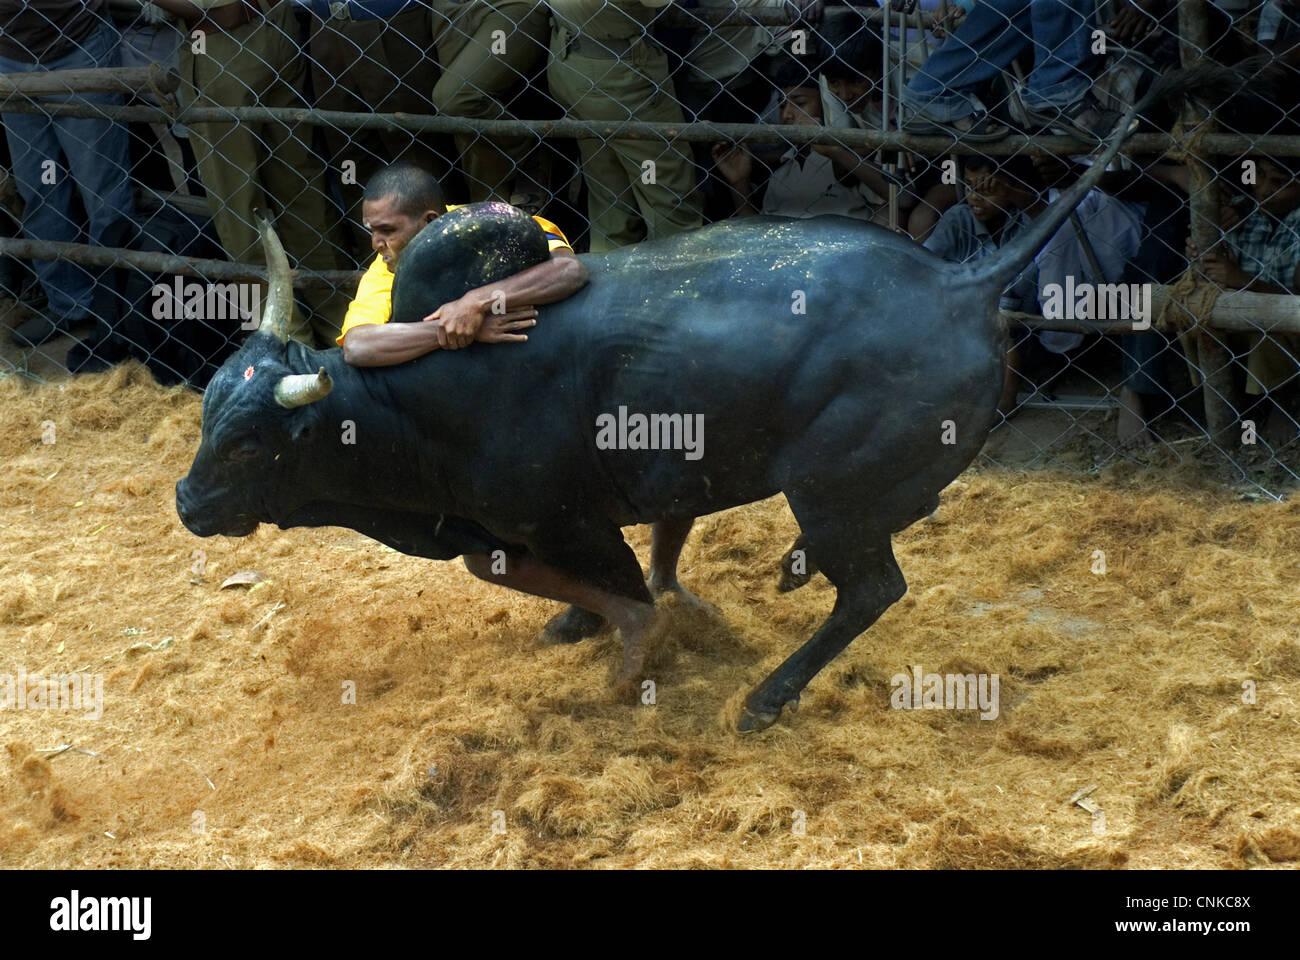 Domestic Cattle Zebu Bos indicus bull man holding onto hump during 'Jallikattu' 'Taming Bull' ancient - Stock Image